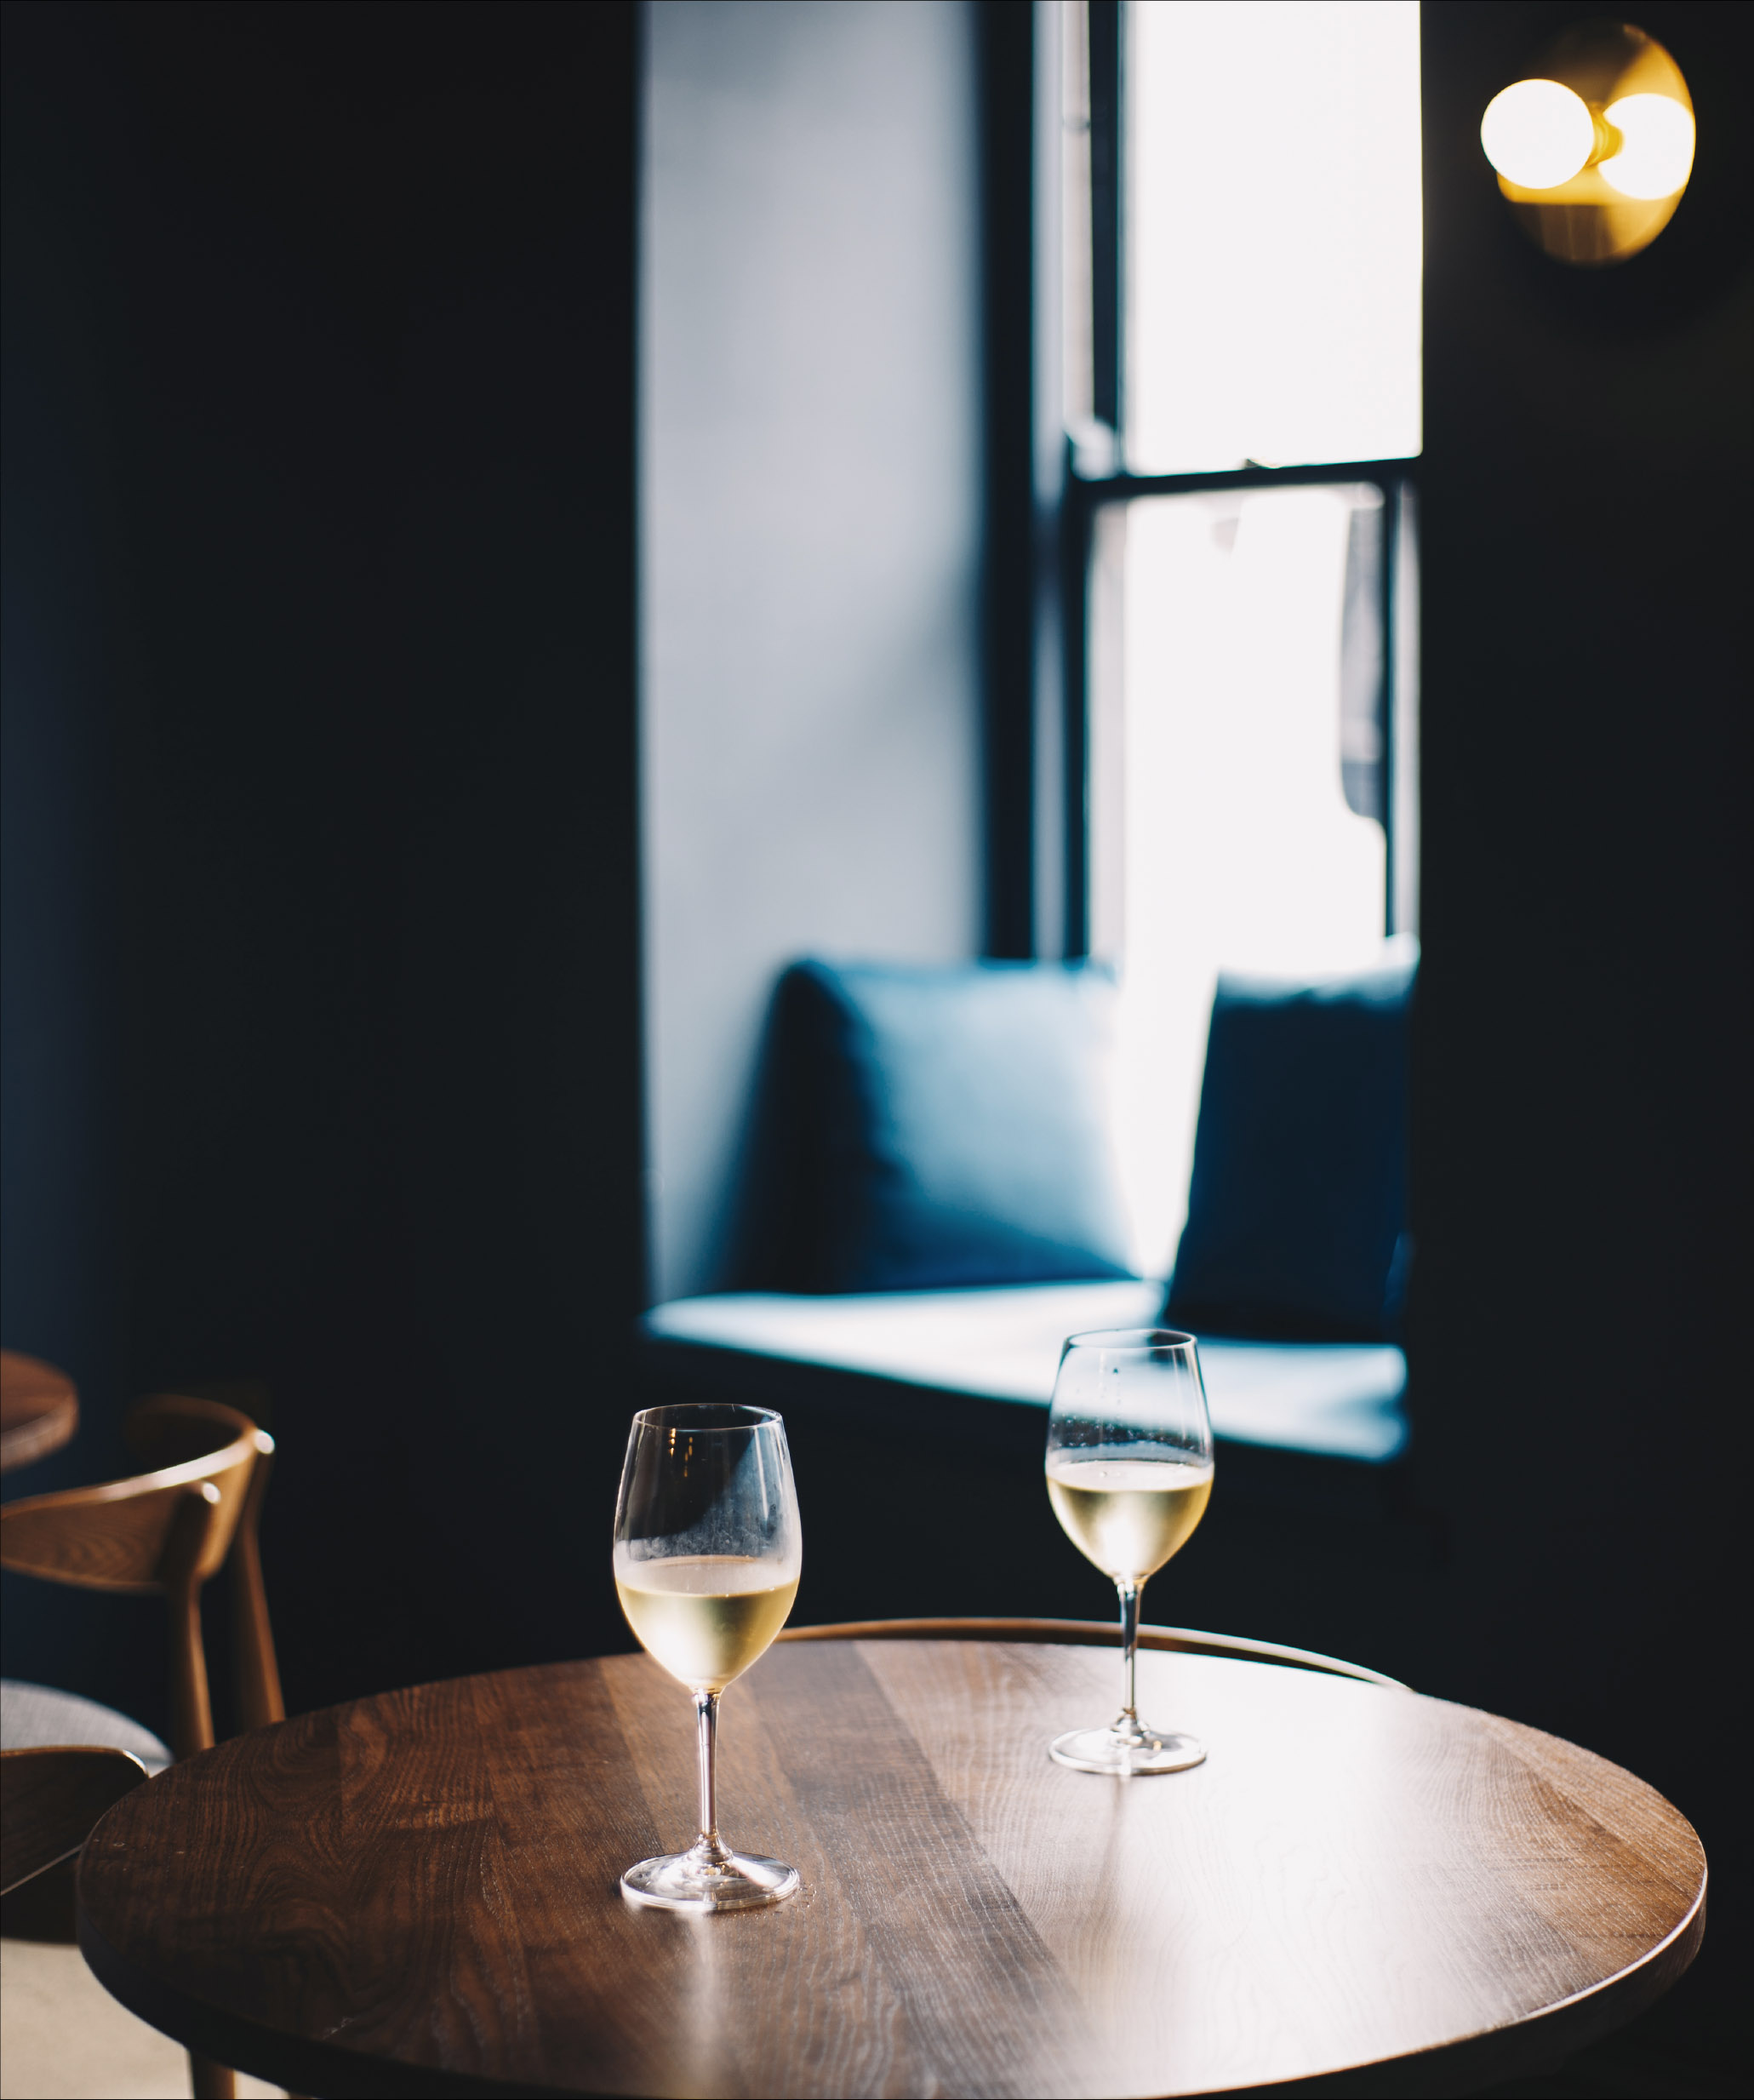 caroy-house_skye_hotel-bar_wine.jpg